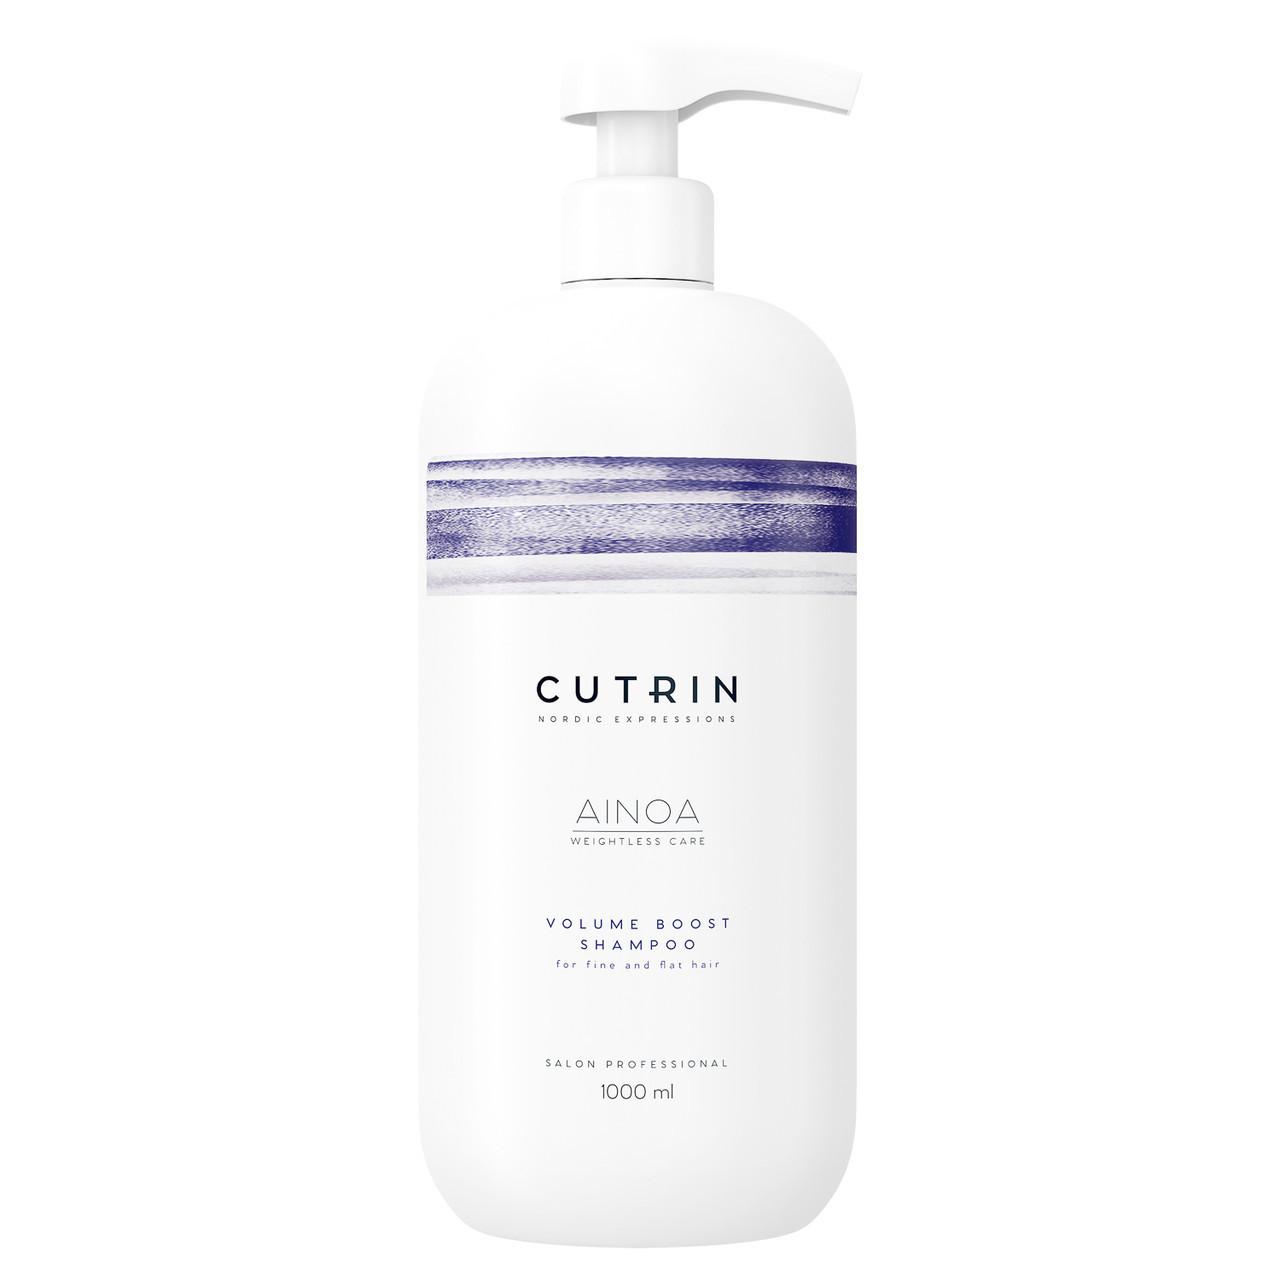 Cutrin volume boost shampoo Шампунь для объема без сульфатов, 1000 мл